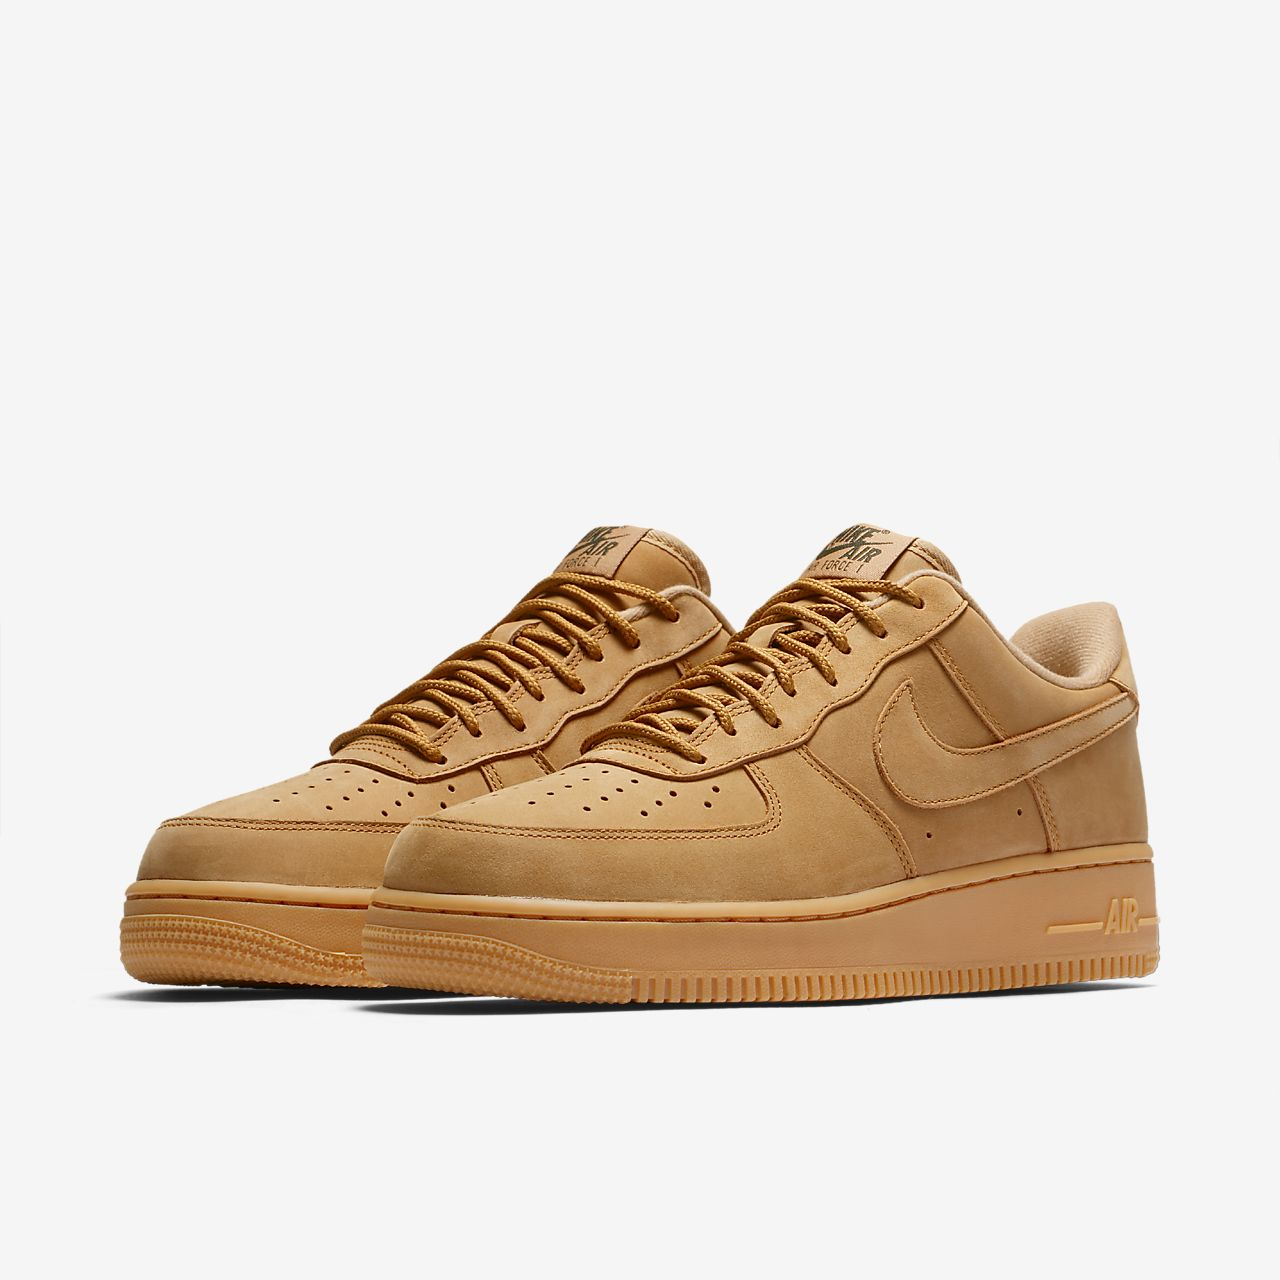 separation shoes 514b4 4b5ef ... Nike Air Force 1  07 WB Men s Shoe